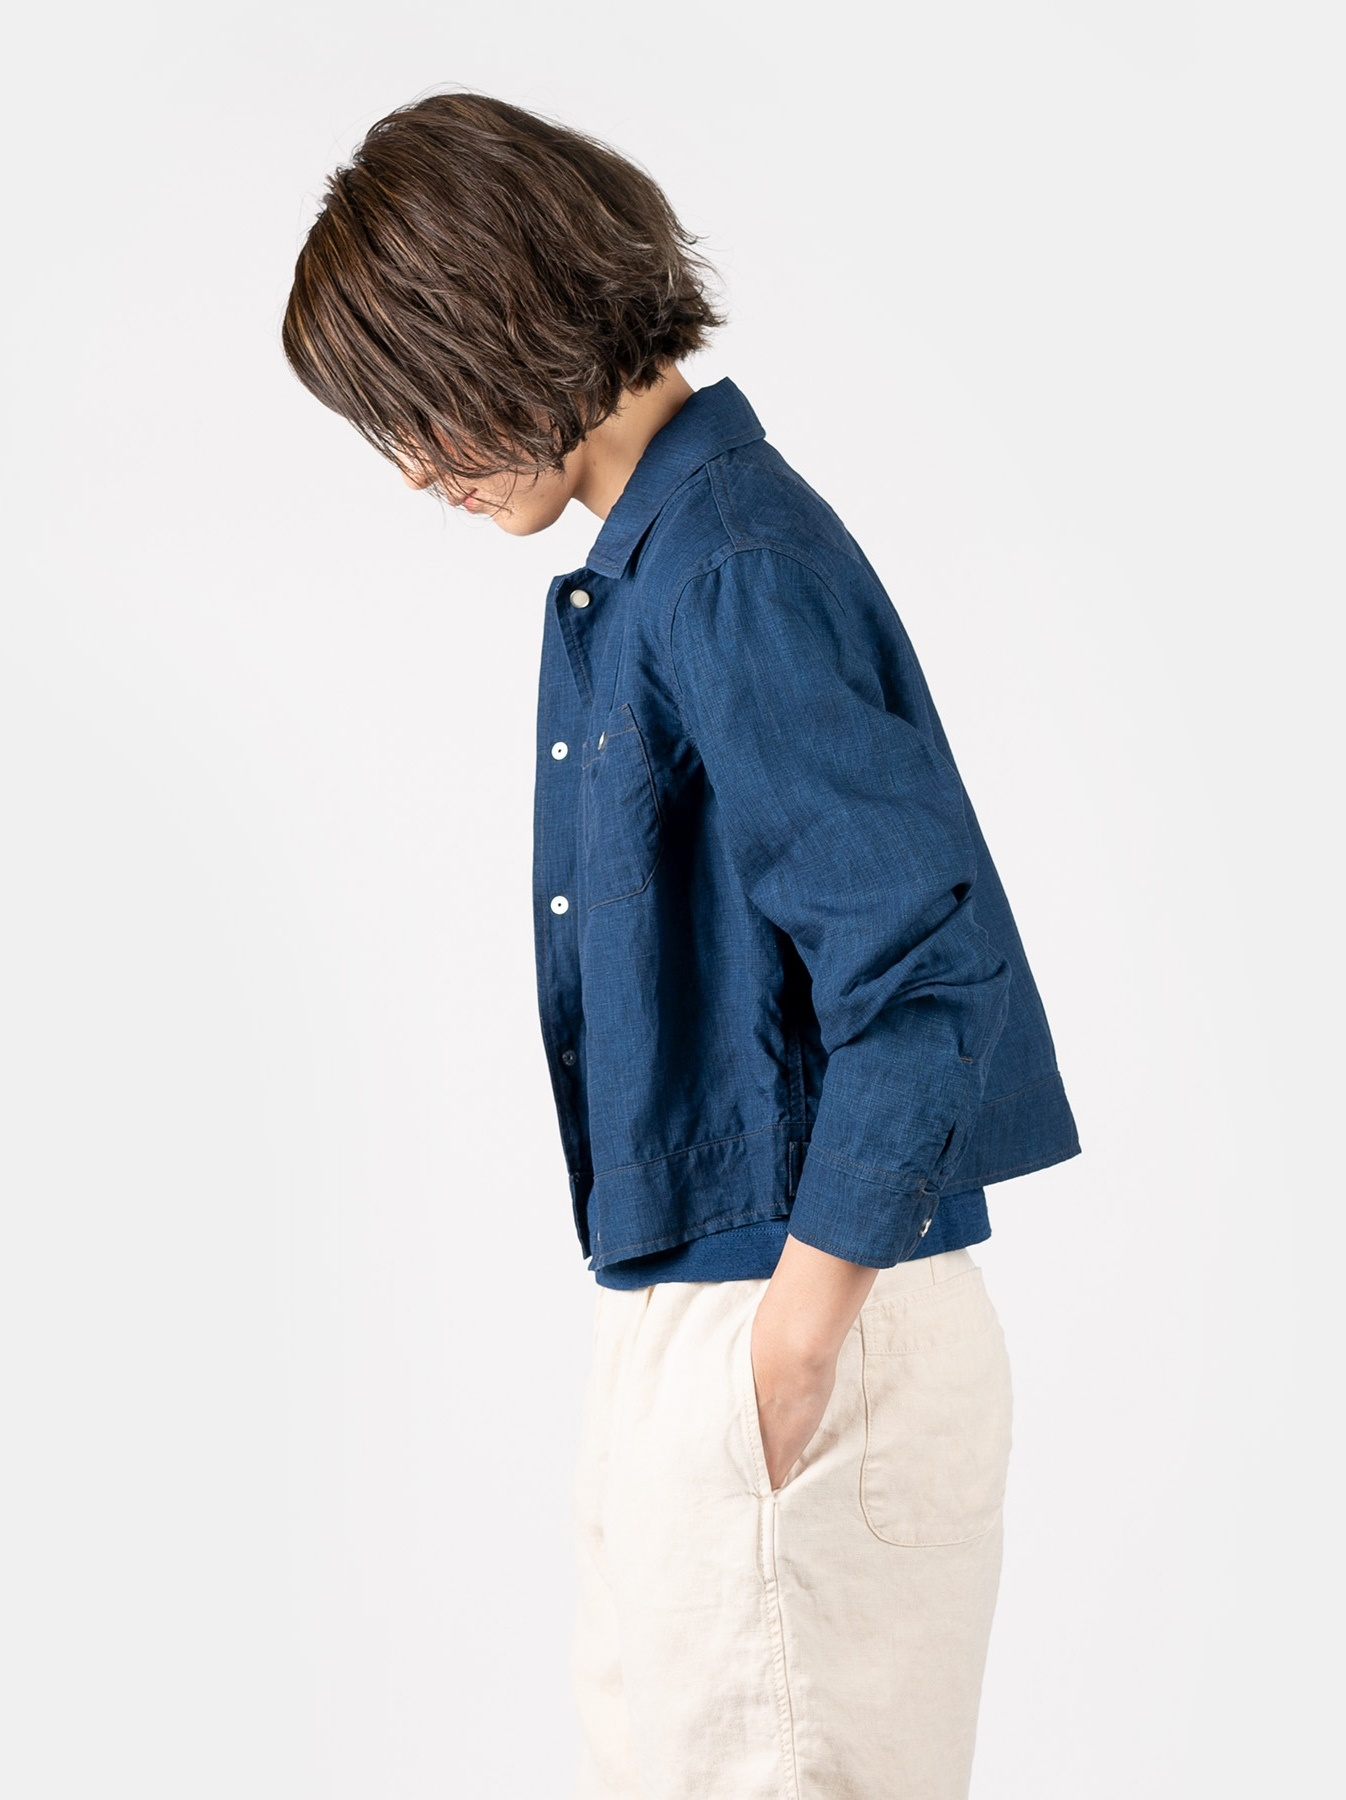 WH Indigo Linen Jean Jacket Bolero-4